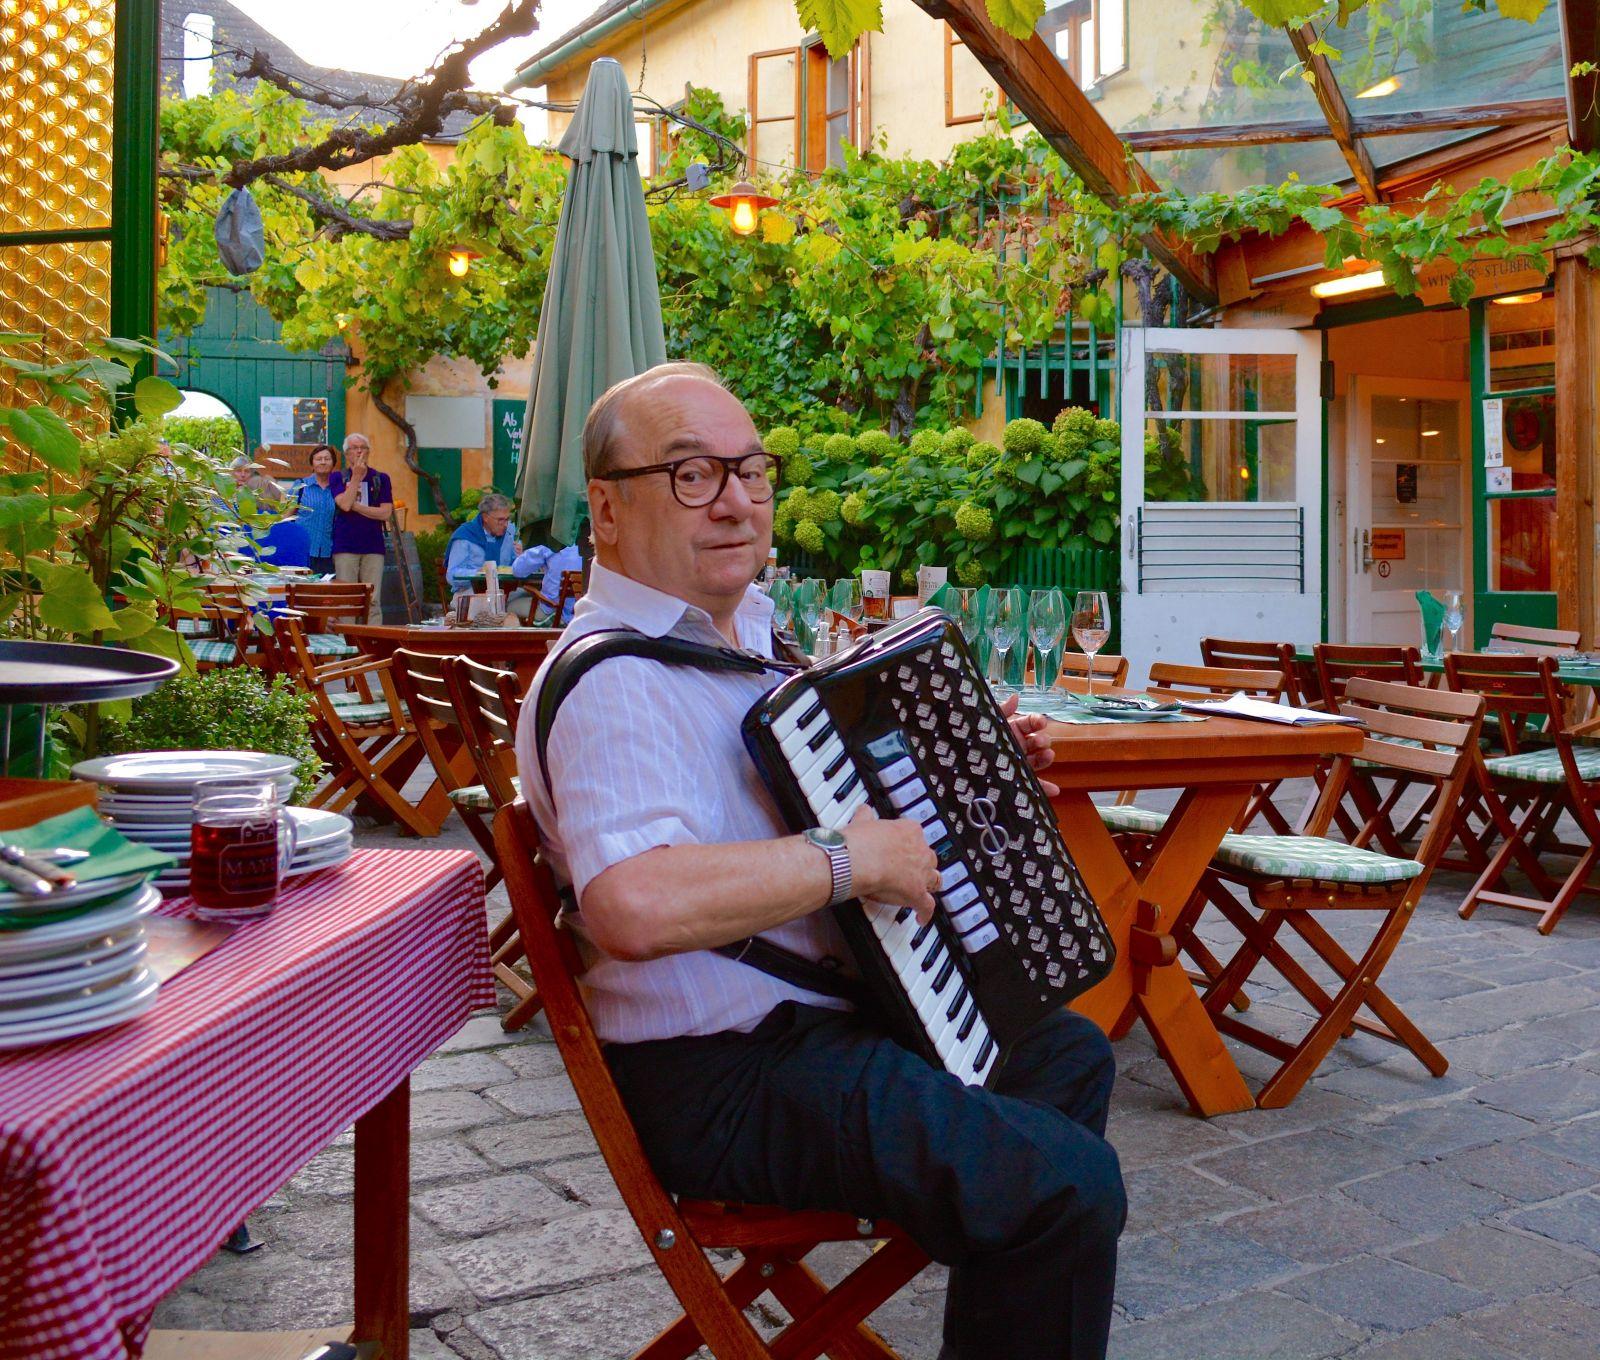 accordion-player-mayer-am-pfarrplatz-vienna